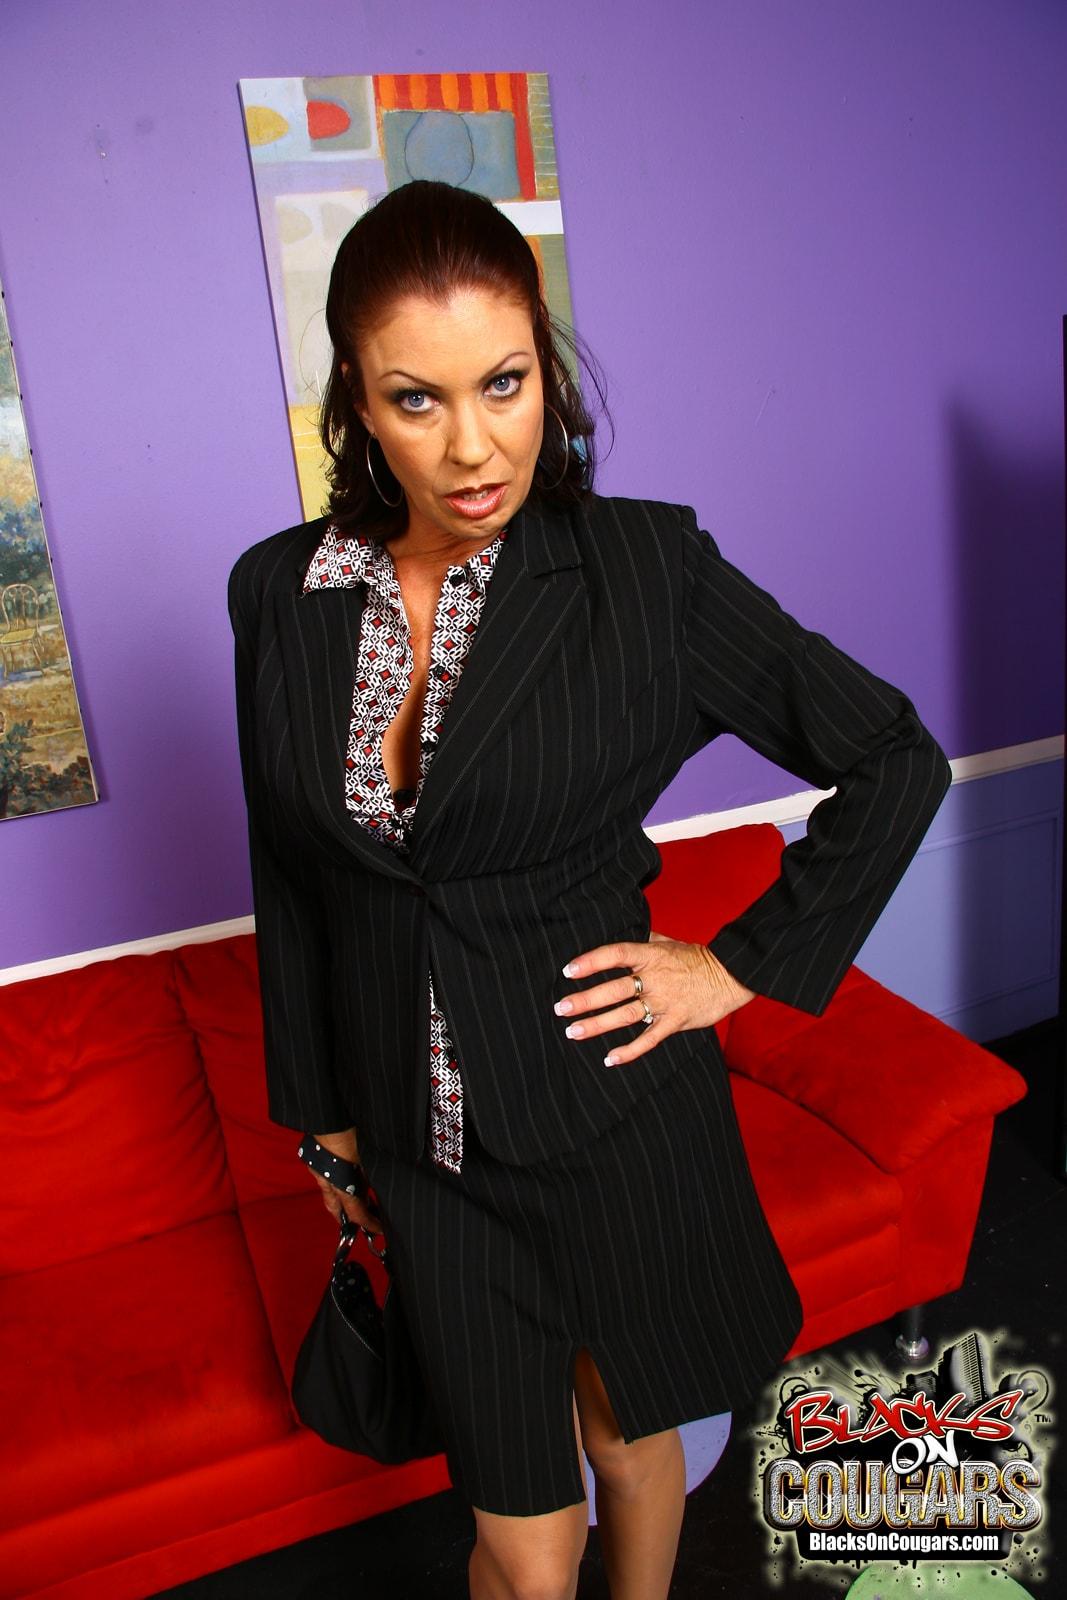 Dogfart '- Blacks On Cougars' starring Vanessa Videl (Photo 5)